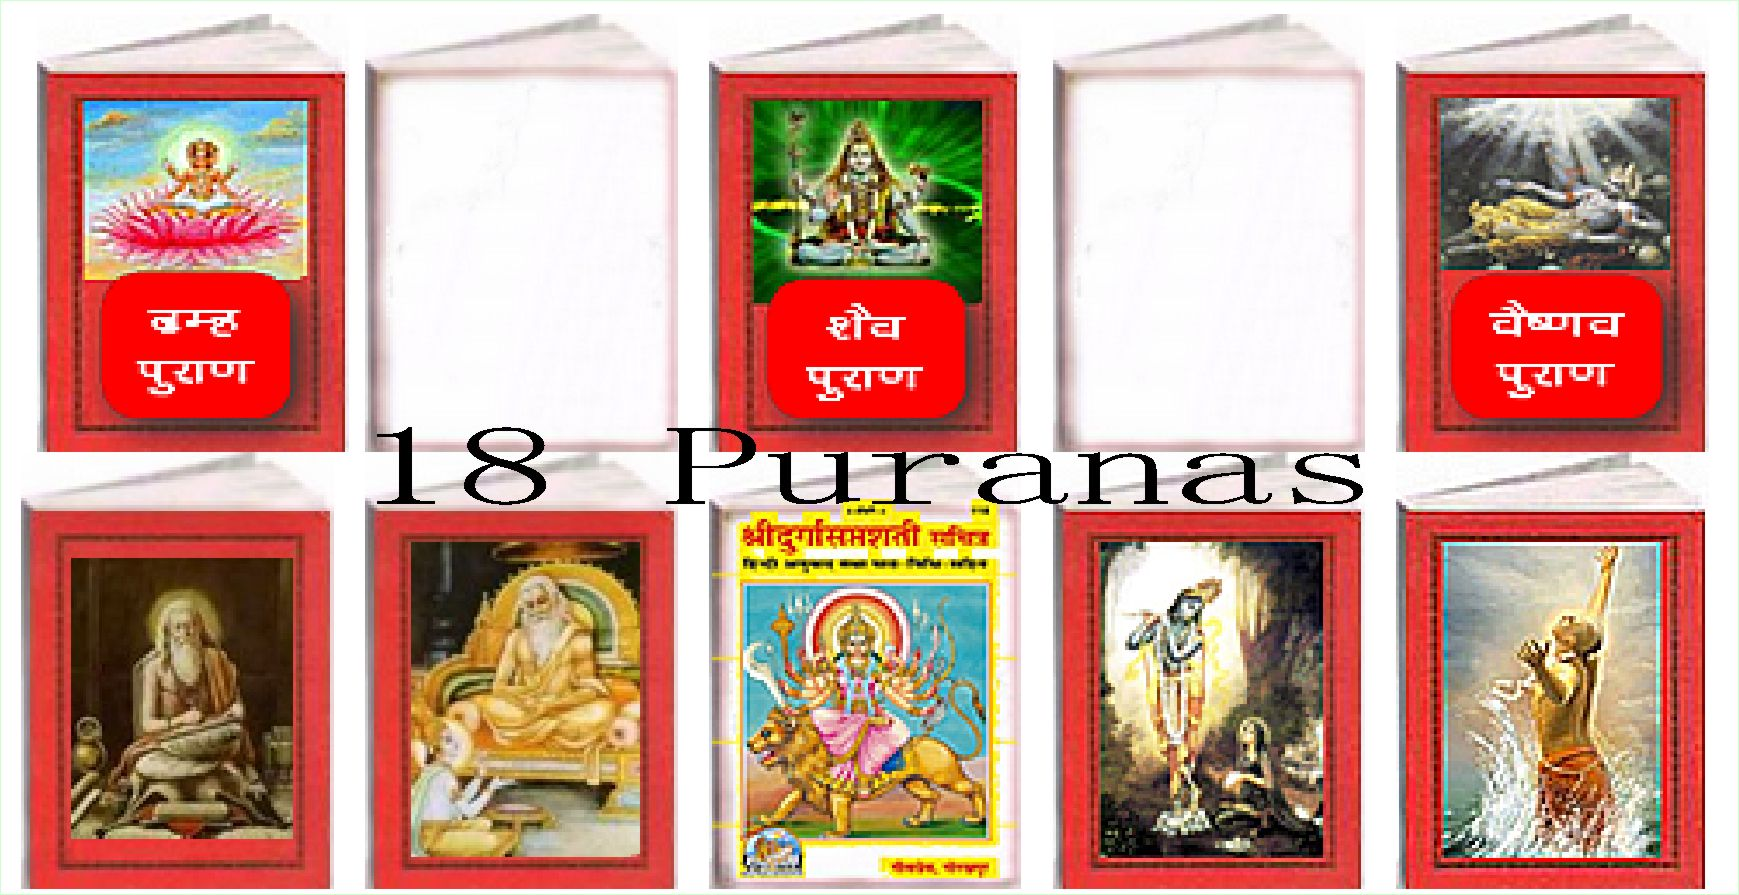 Pdf garud puran in marathi